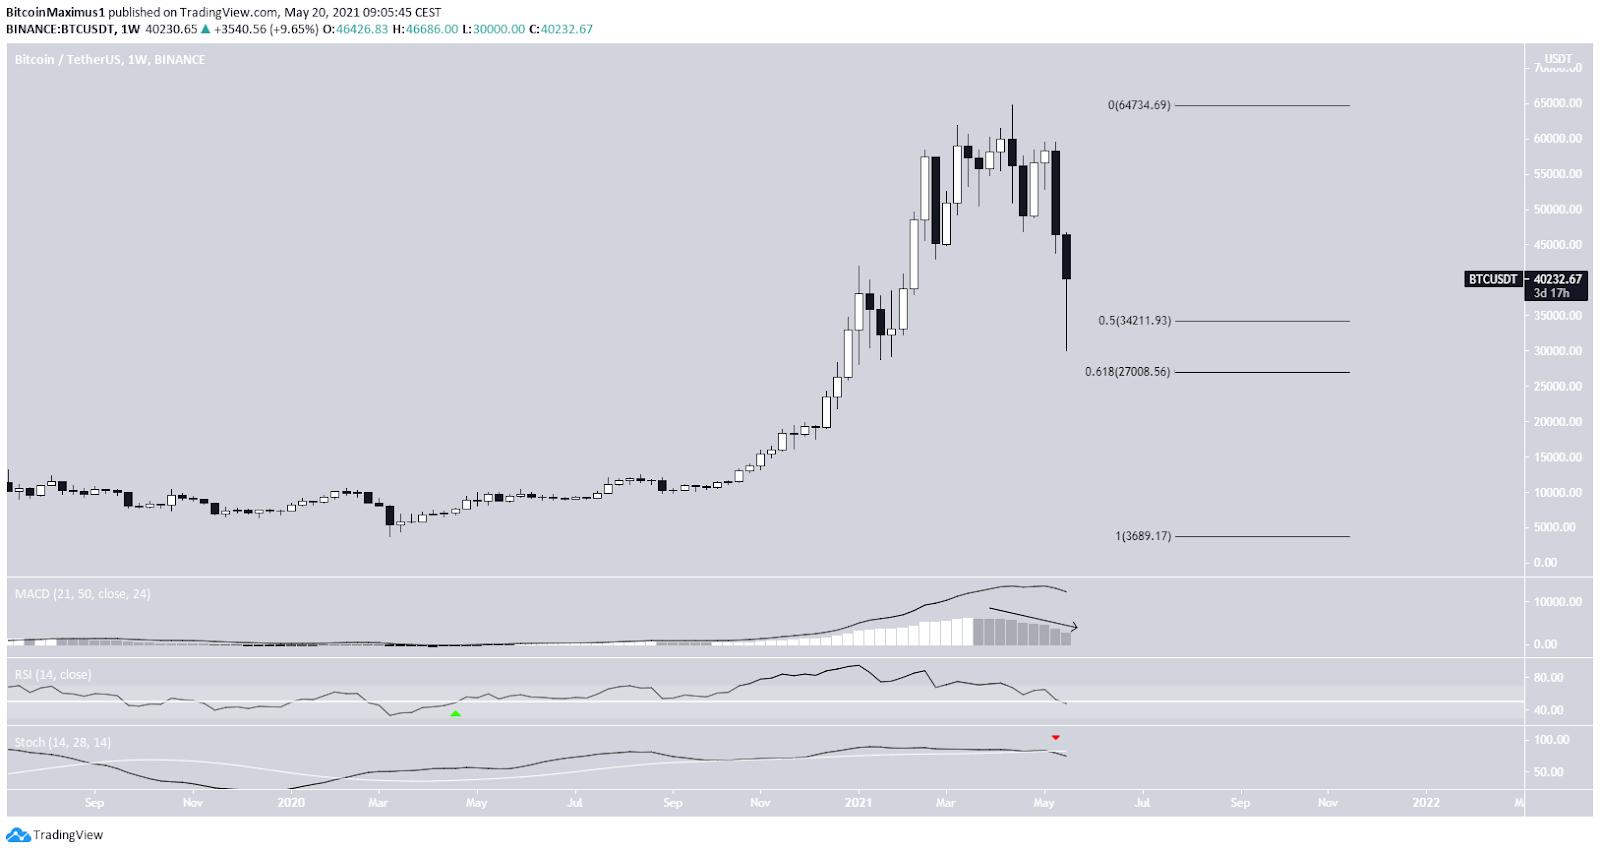 Bitcoin Preis Kurs Wochenchart 20.05.2021